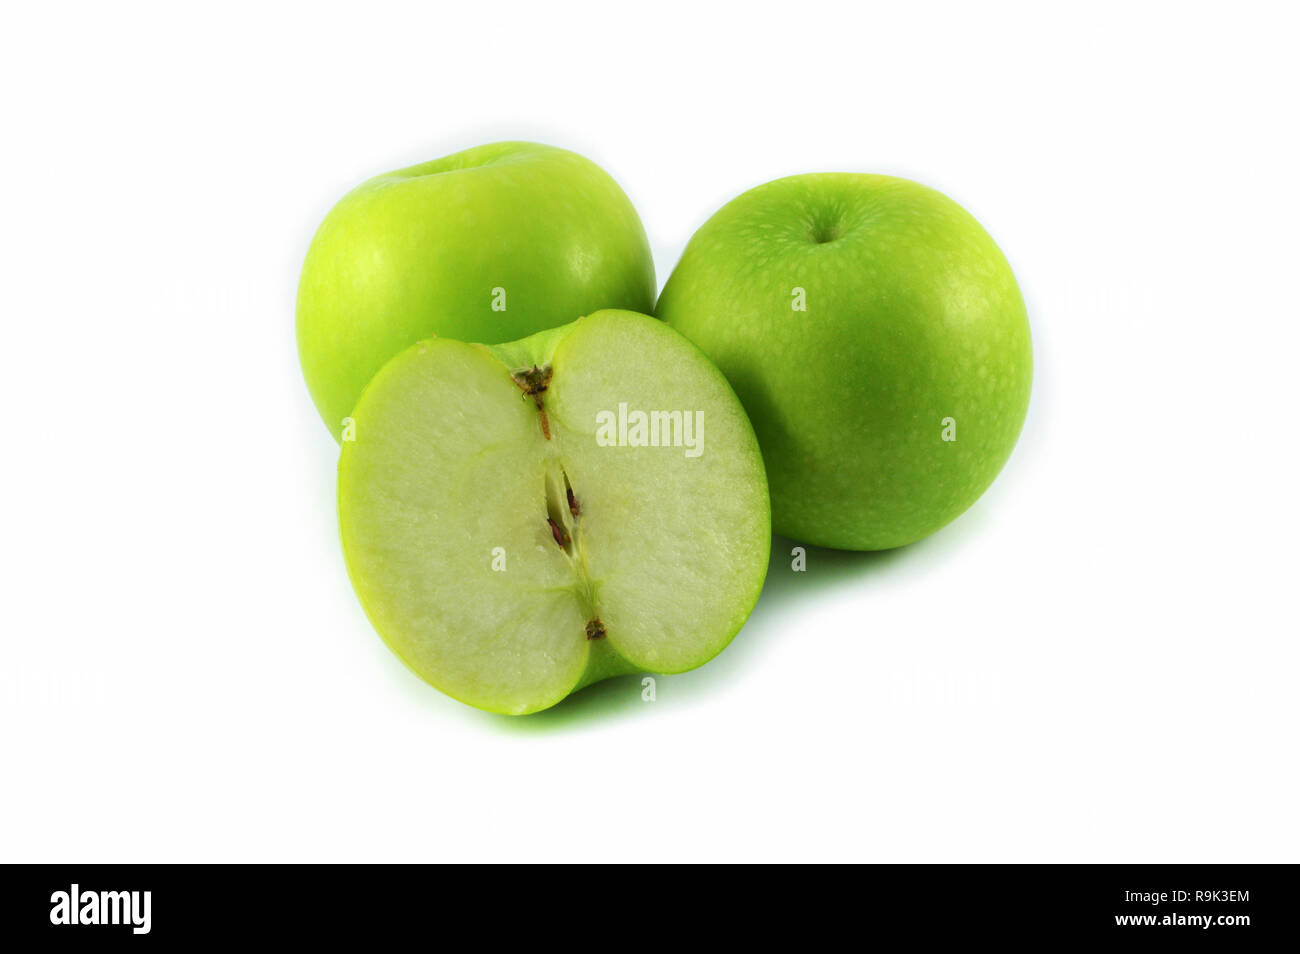 Green apple isolate on white background / three green fresh